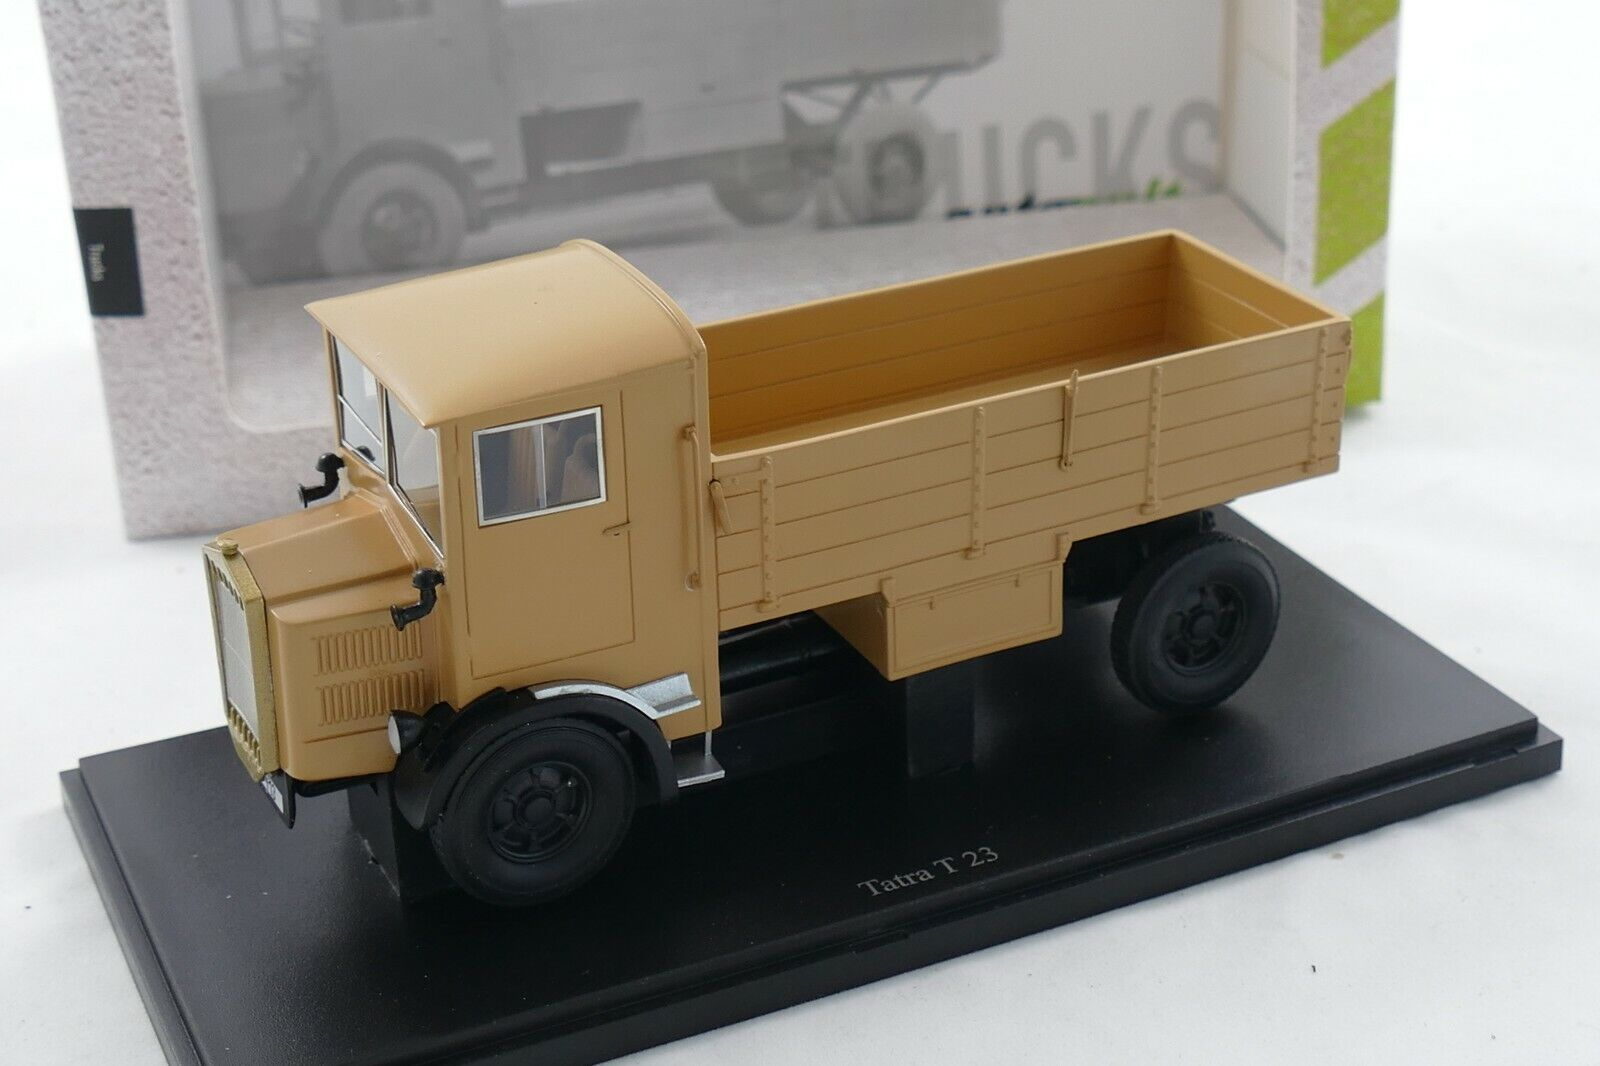 Tatra rt23 1931-autocult 1 43 - atc11010